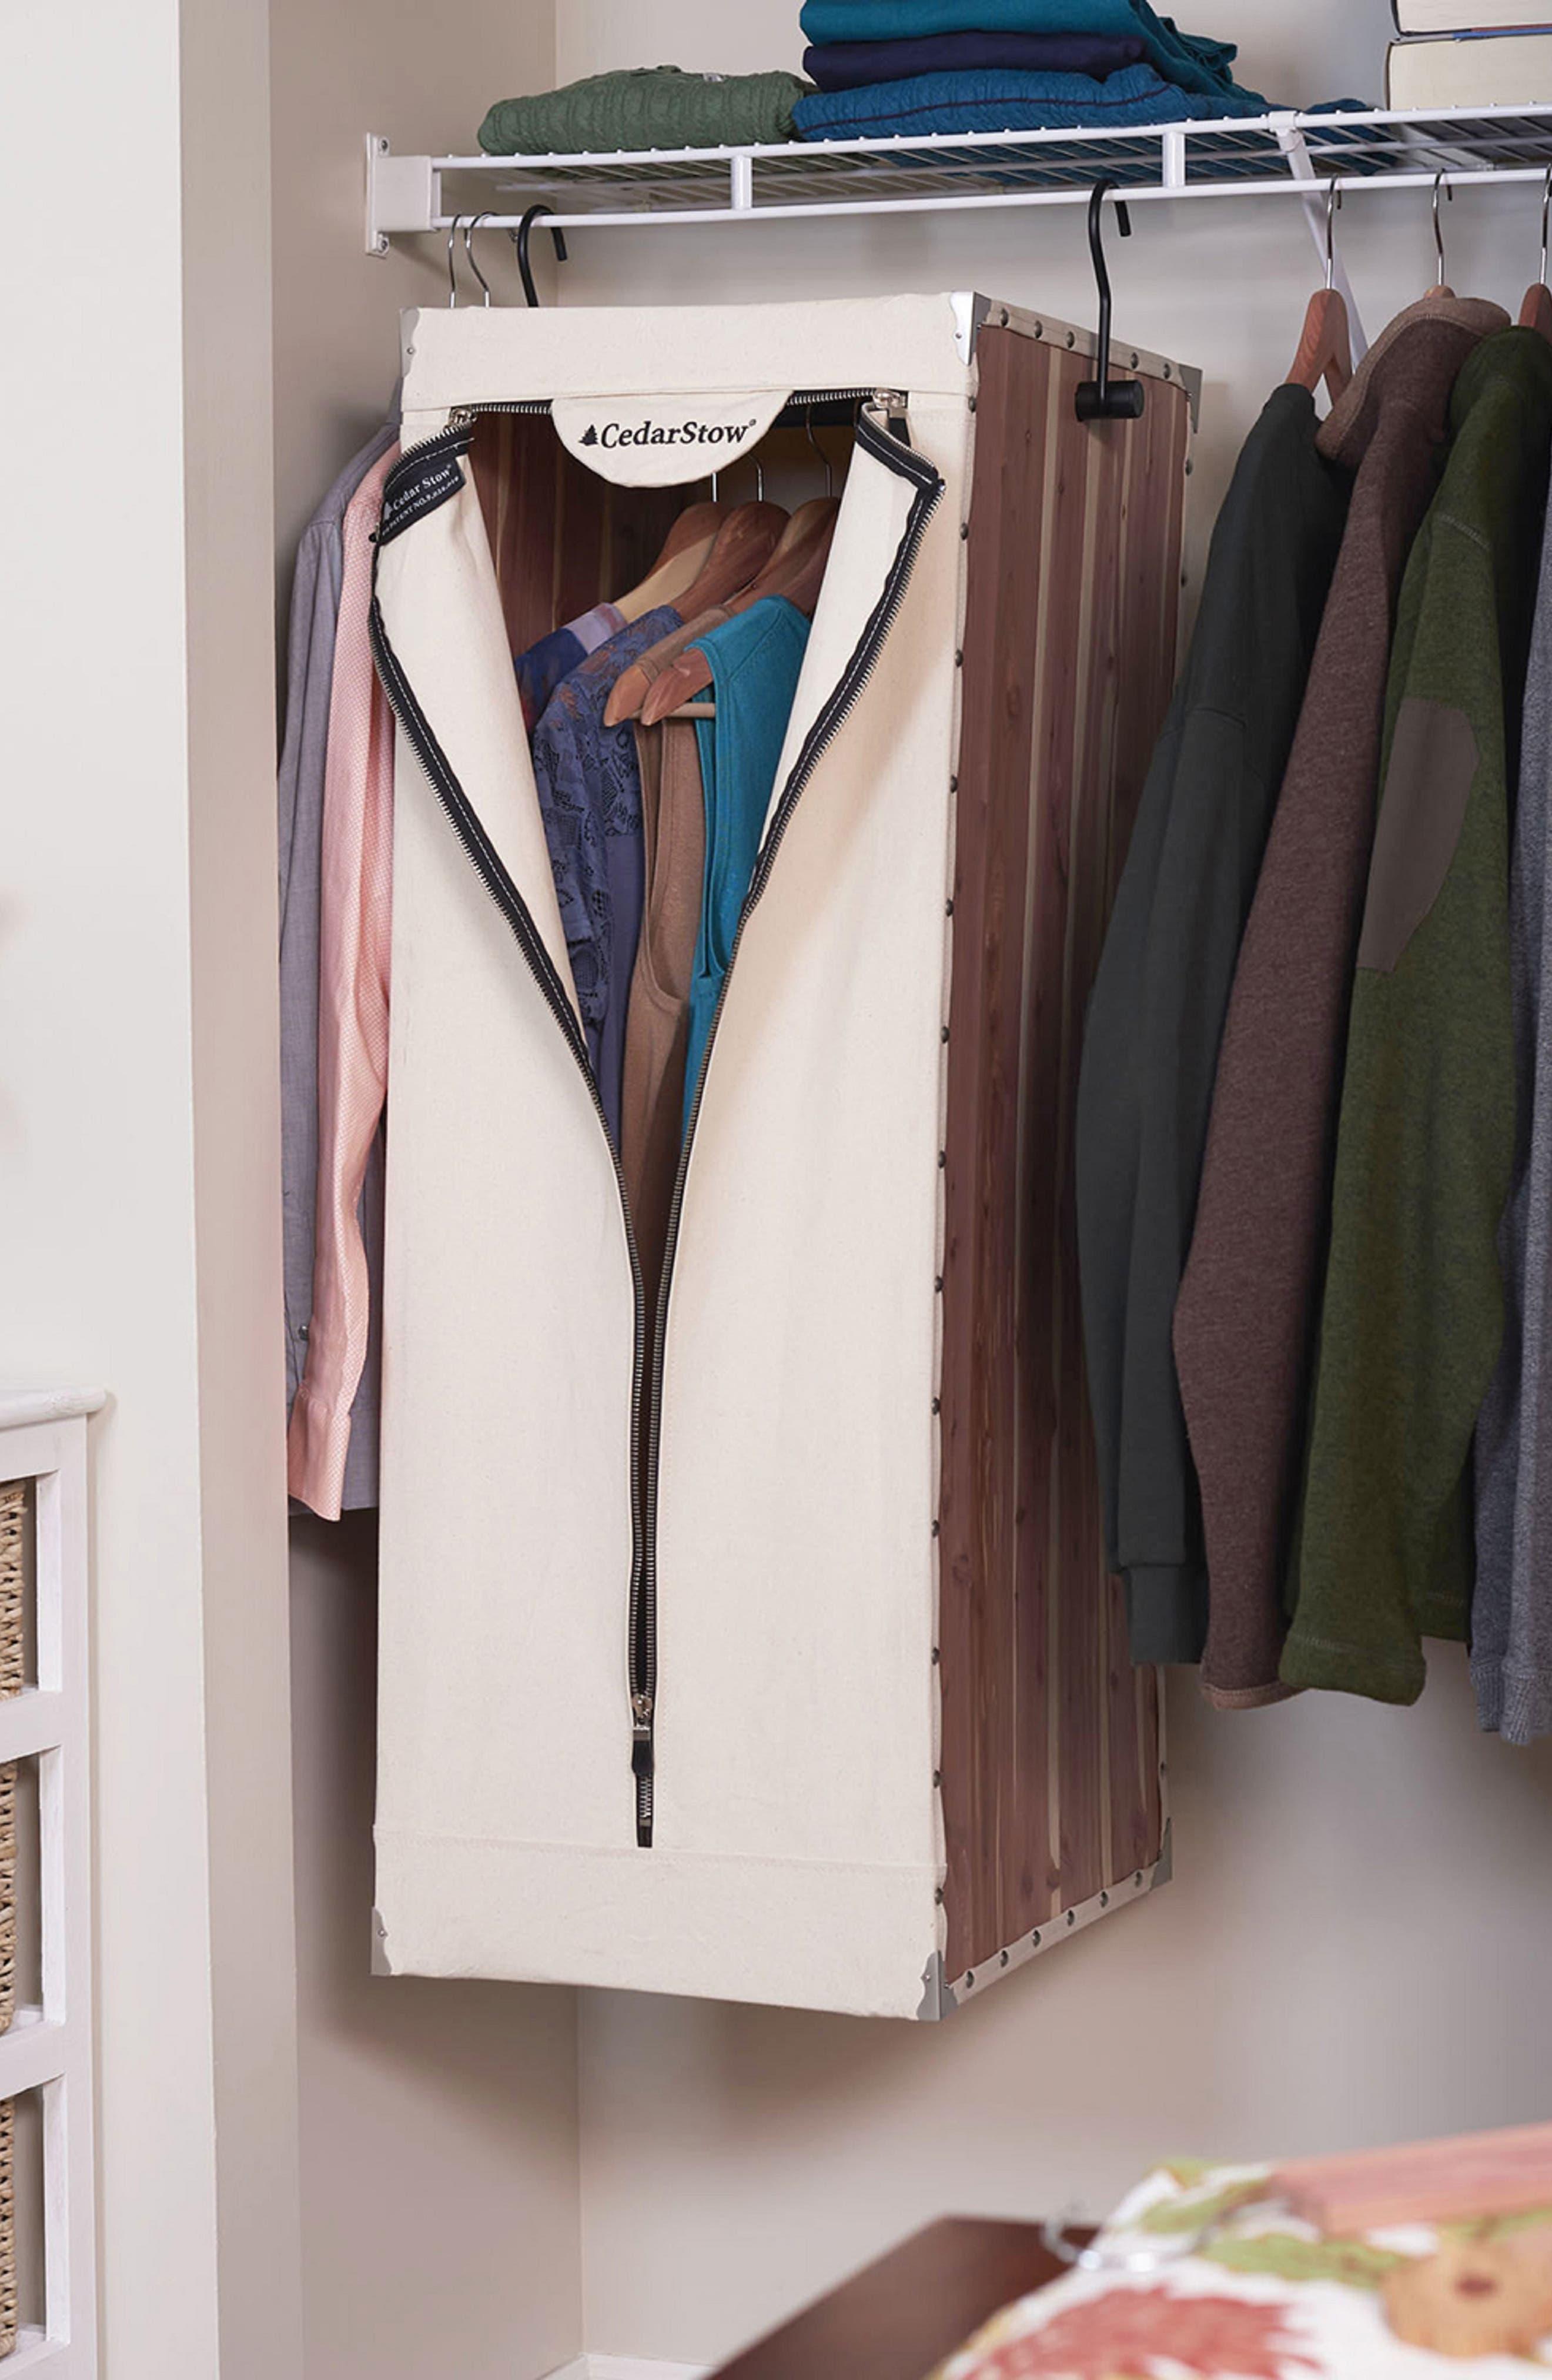 CedarStow Clothing Wardrobe,                             Alternate thumbnail 5, color,                             BEIGE AND CEDAR